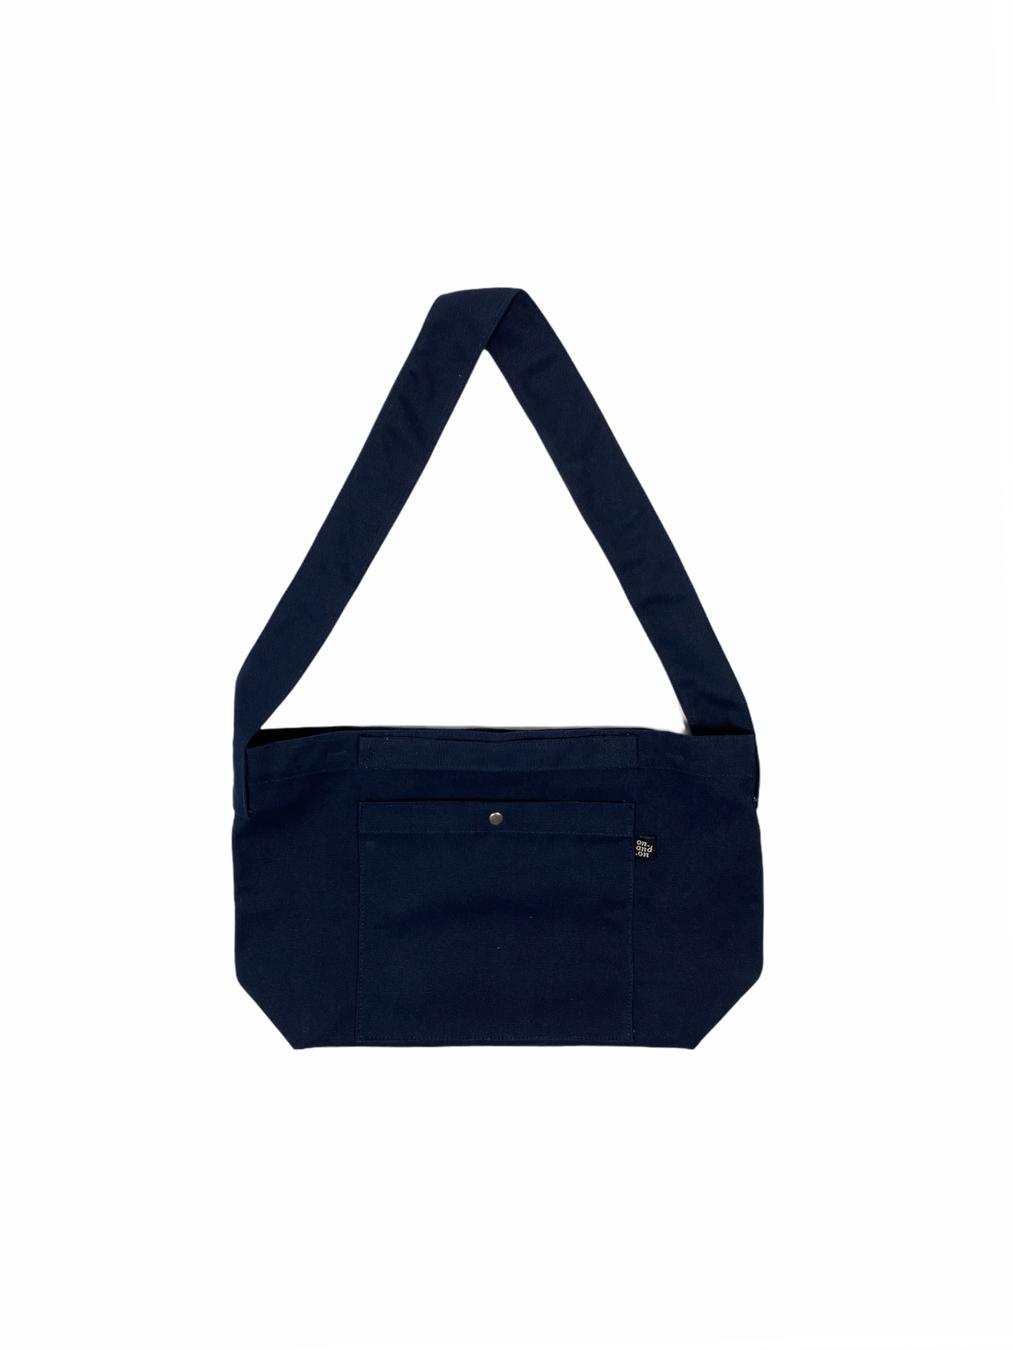 Nerdy Bag (Art)